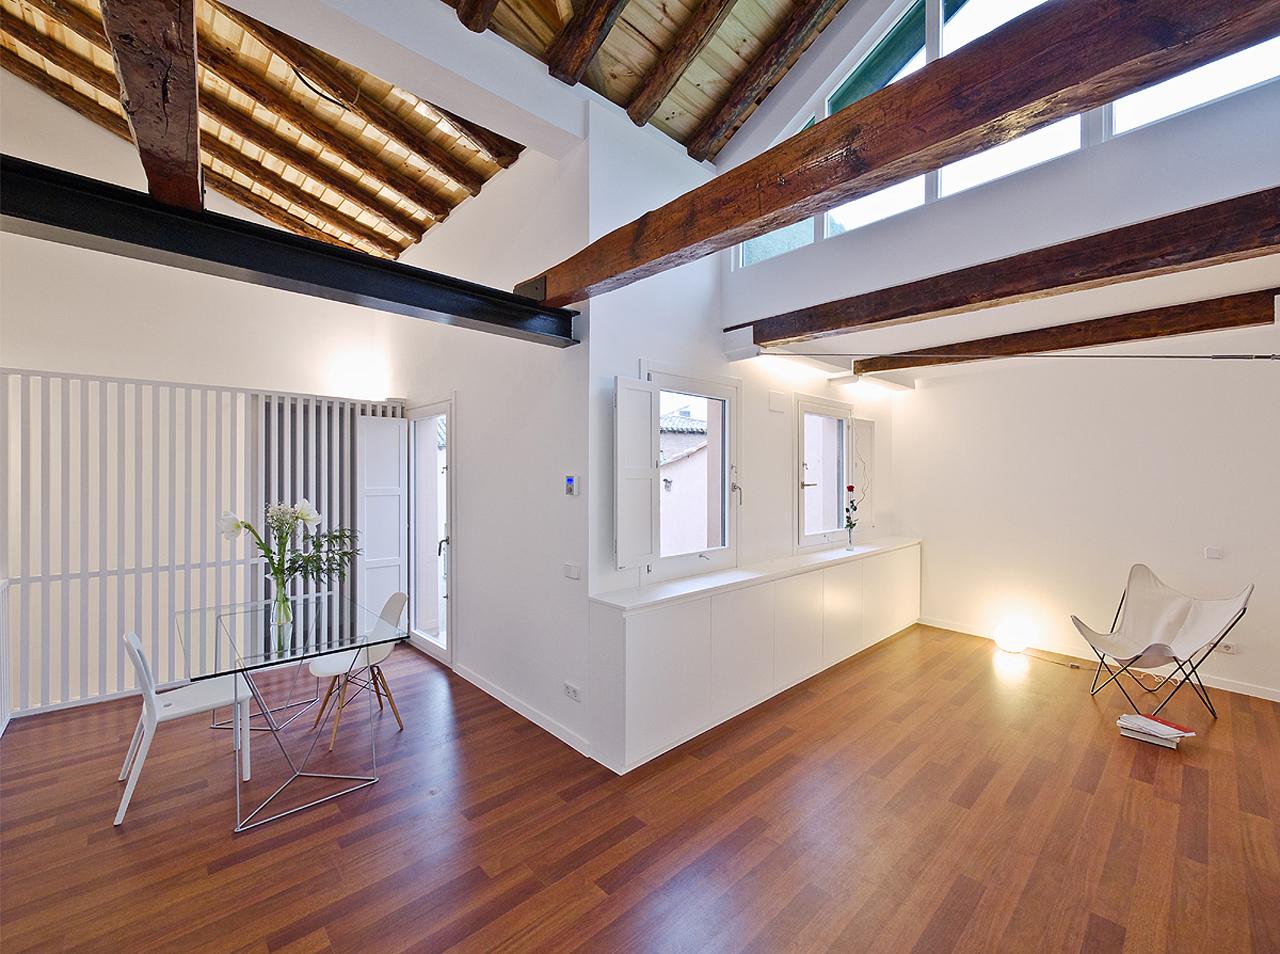 Toledo Apartment Renovation / Romero Vallejo Arquitectos, © Juan Carlos Quindós